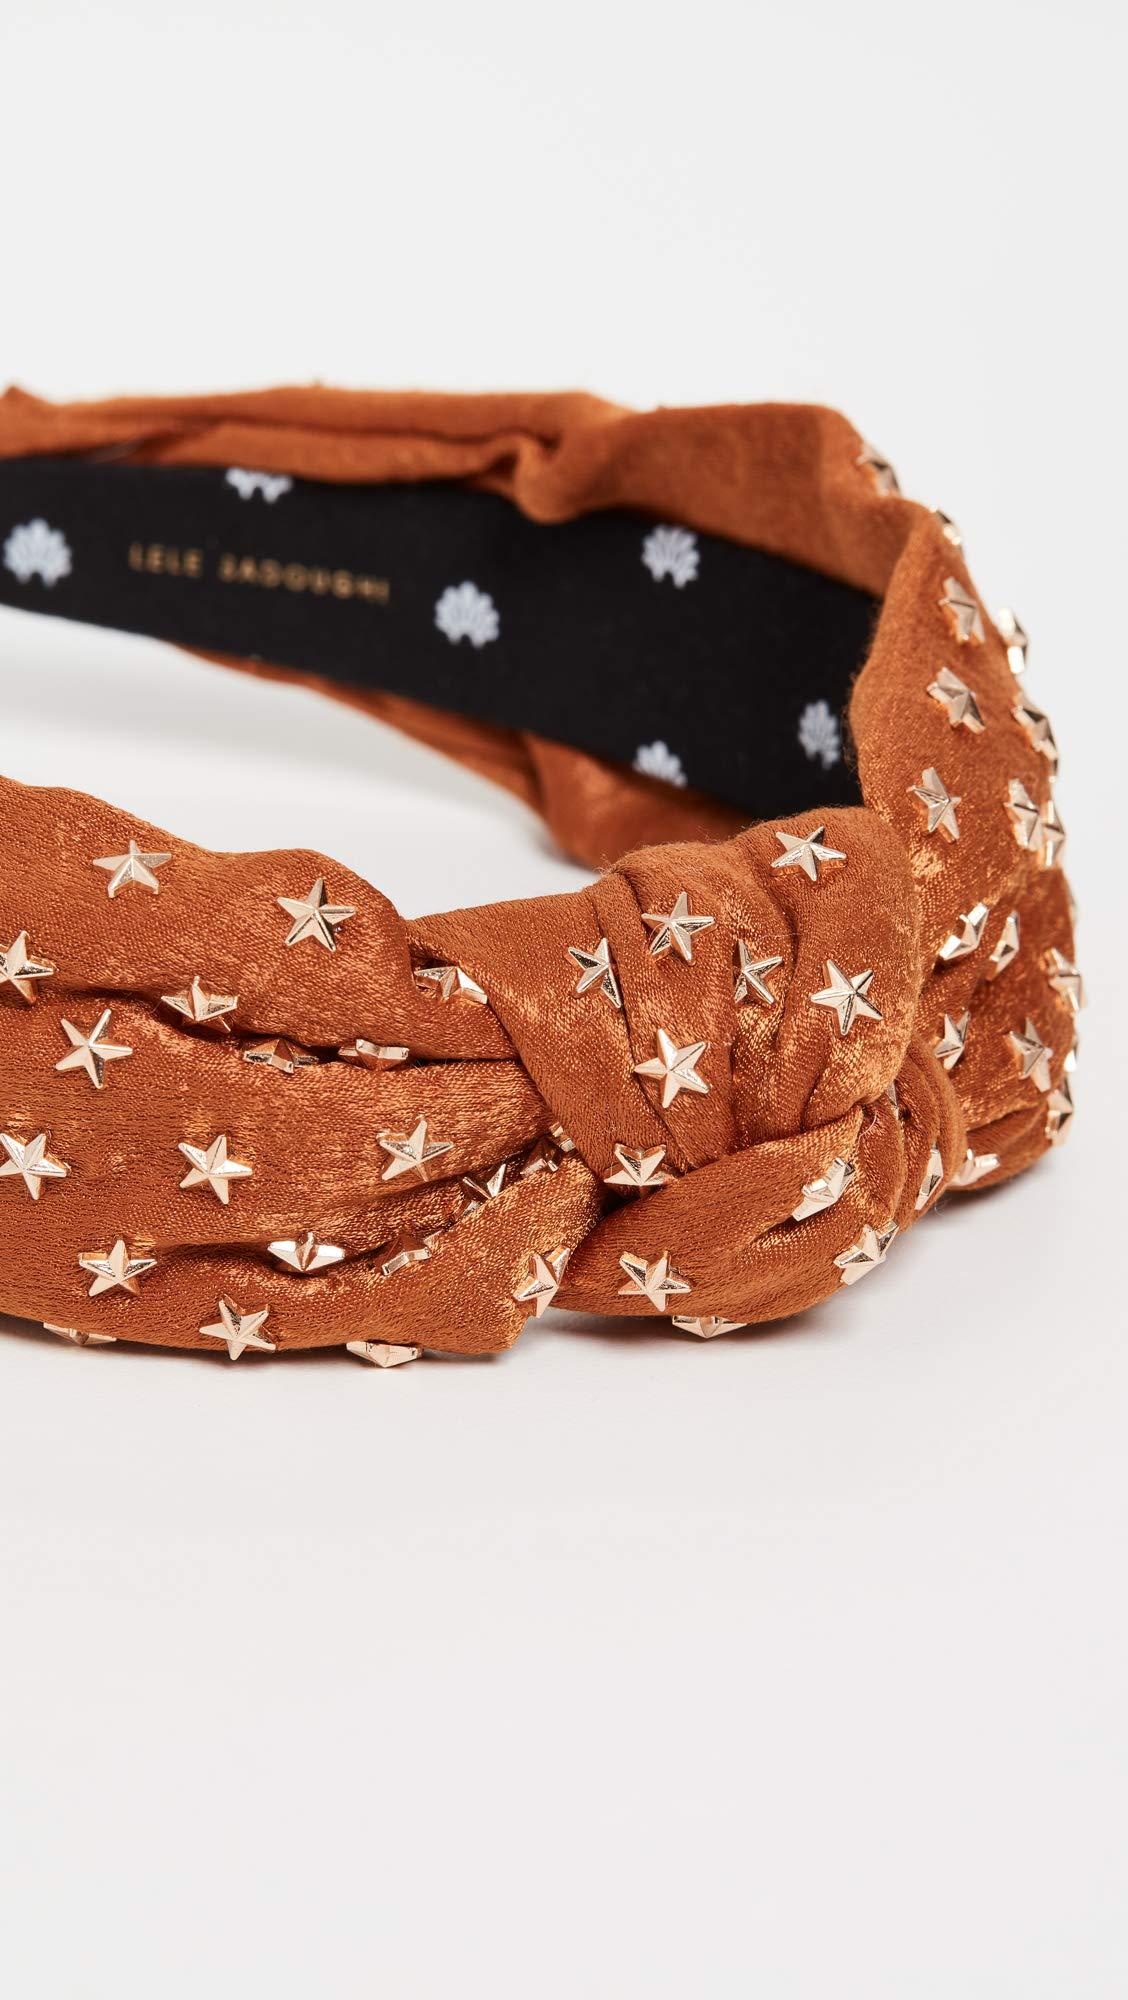 Lele Sadoughi Women's Star Studded Silk Knotted Headband, Copper, Metallic, Bronze, Orange, One Size by Lele Sadoughi (Image #4)